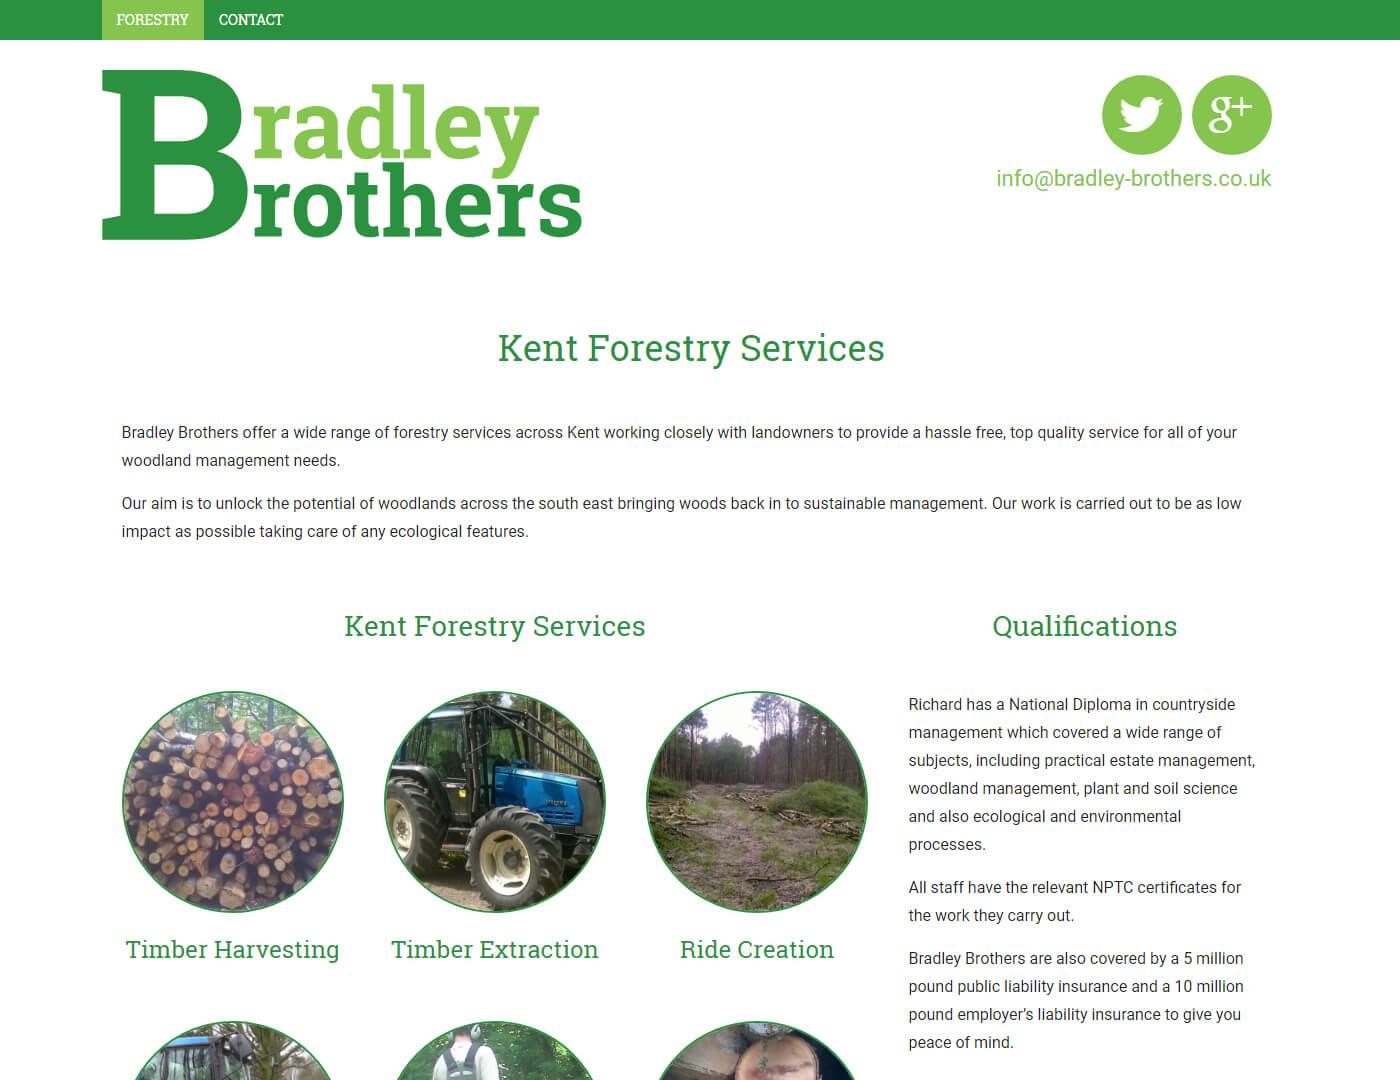 bradley-brothers